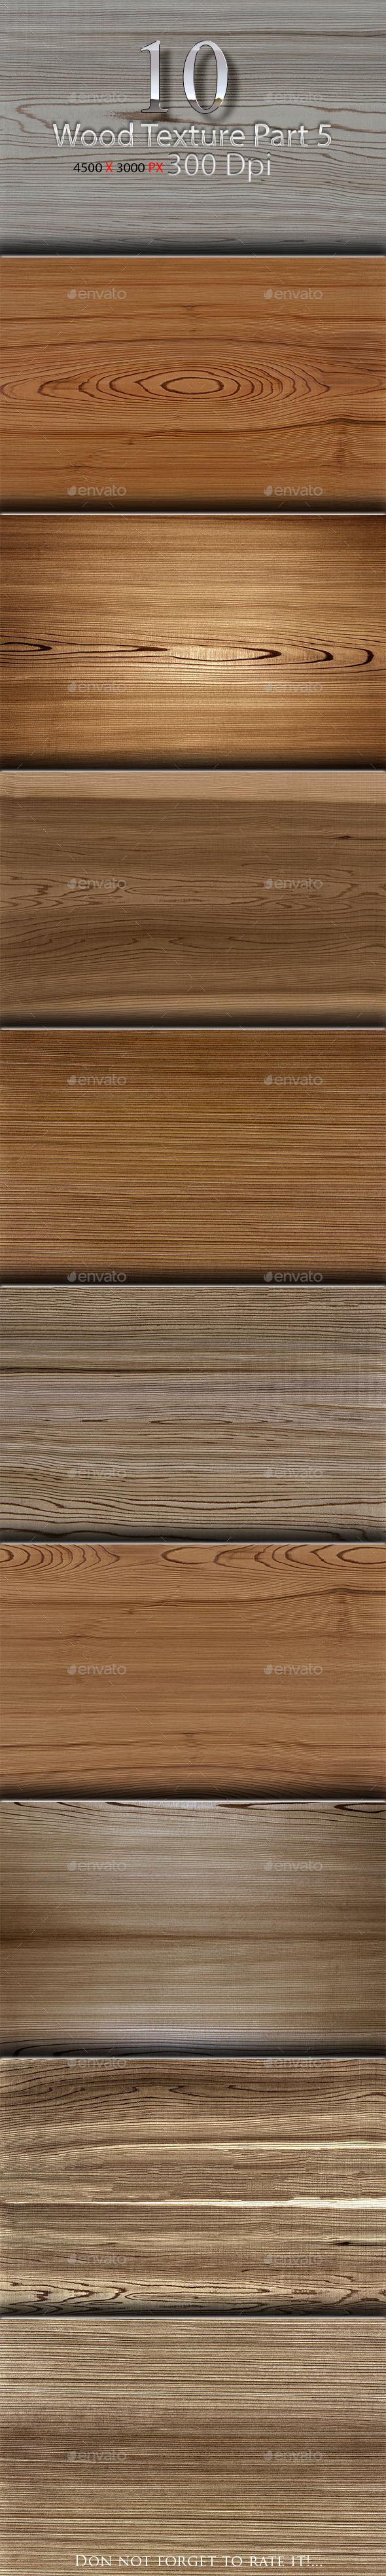 10 Wood Texture Part 5 - Wood Textures